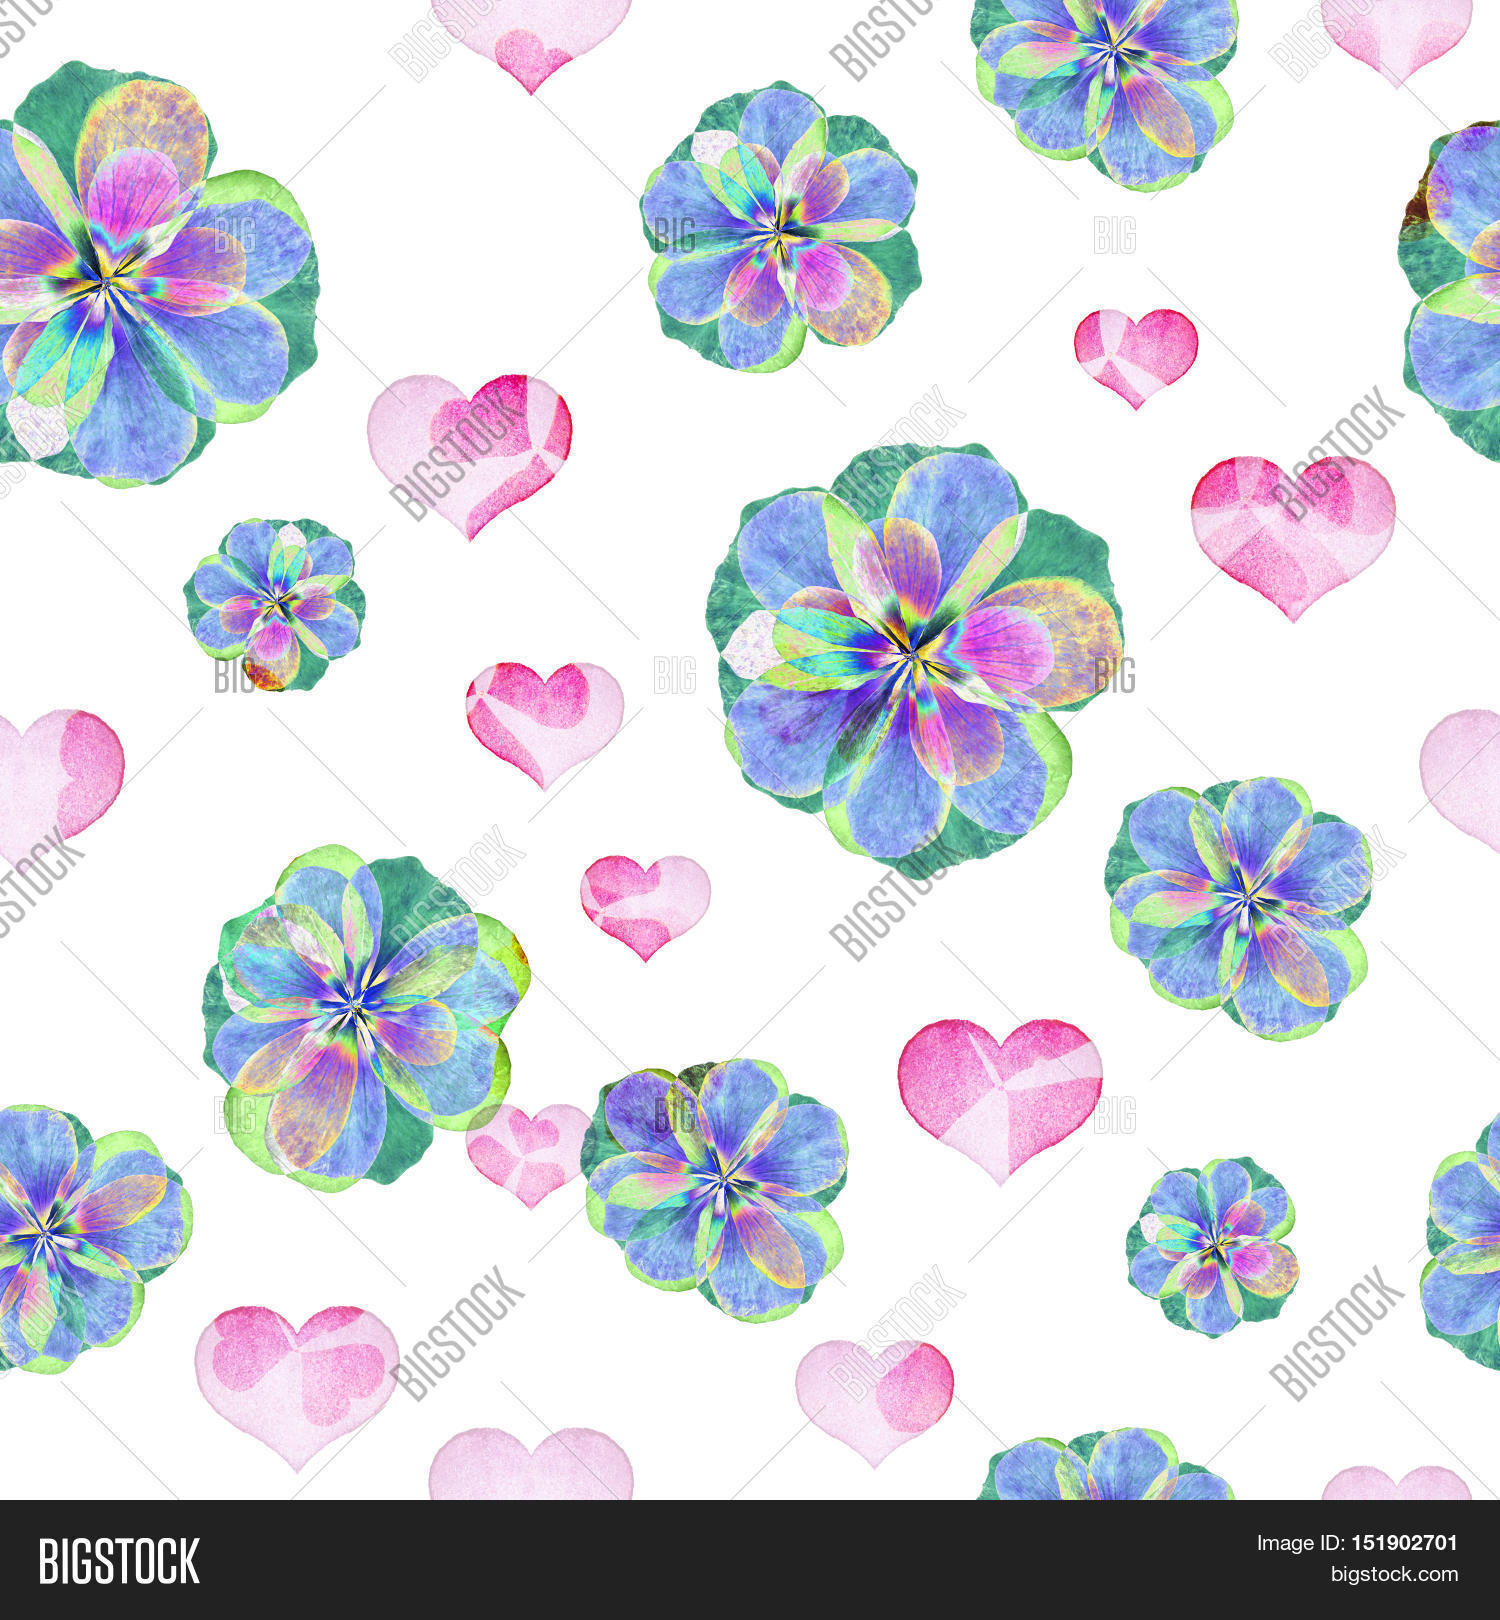 Floral art grunge batik background. Stylization pastel colors.